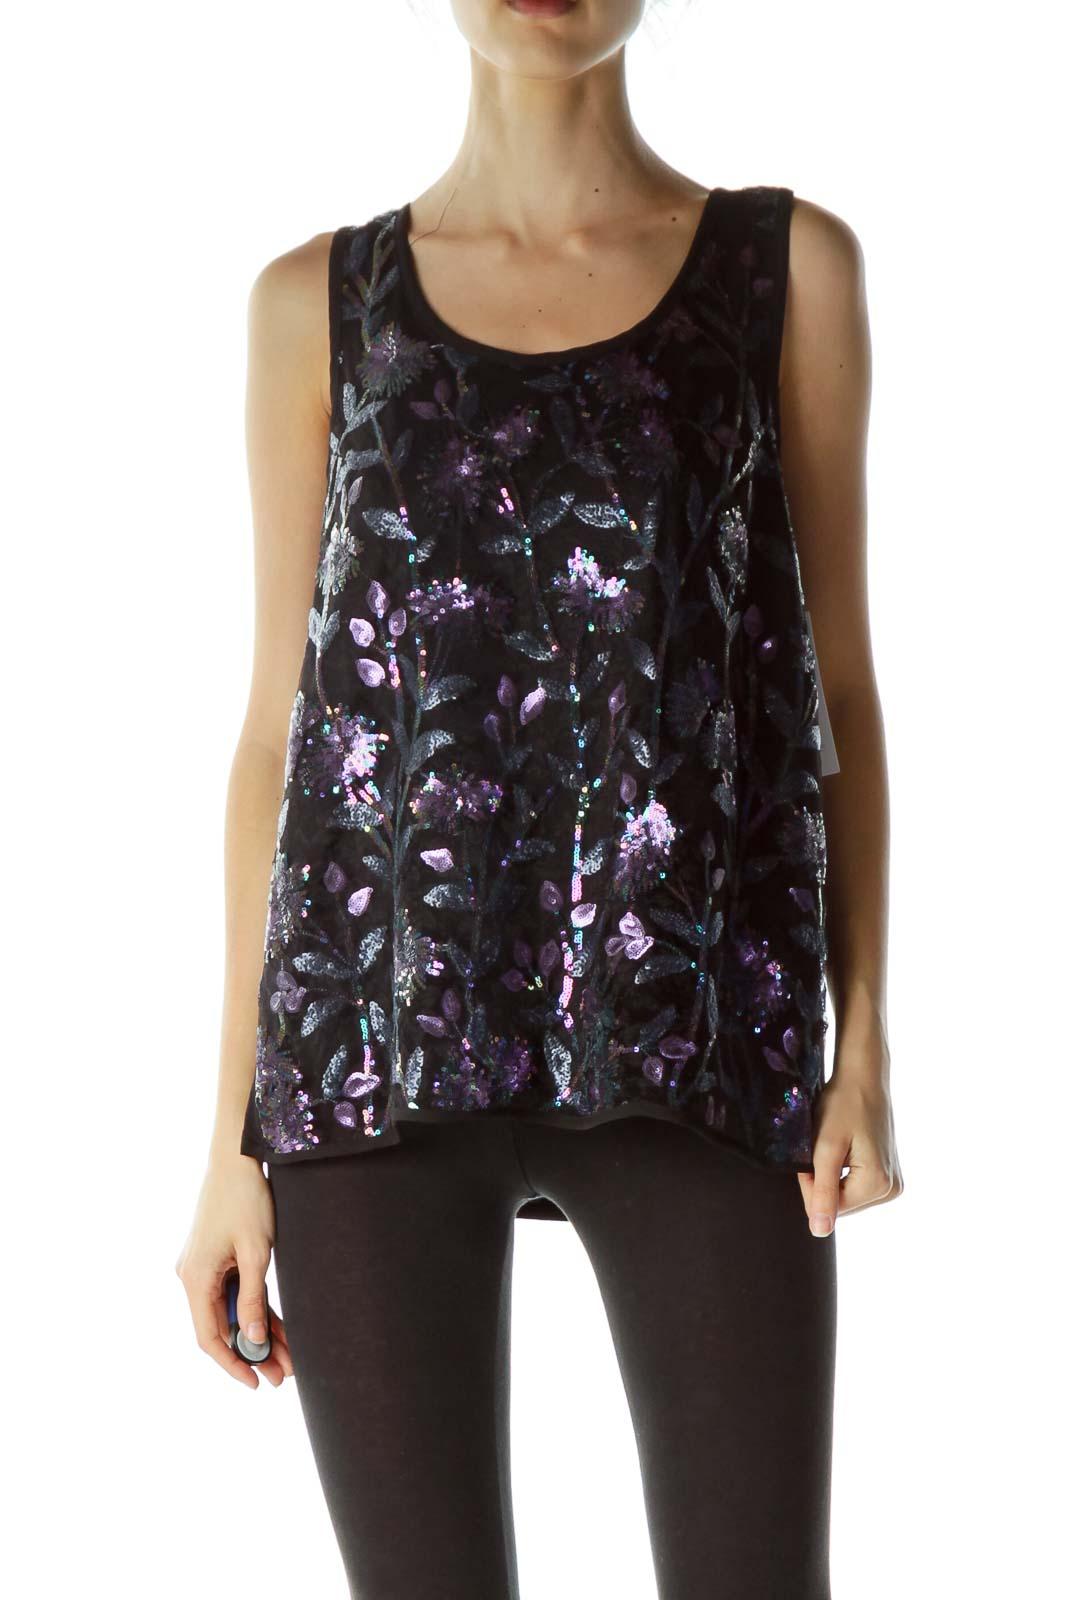 Black Purple Floral Sequins Sleeveless Blouse Front